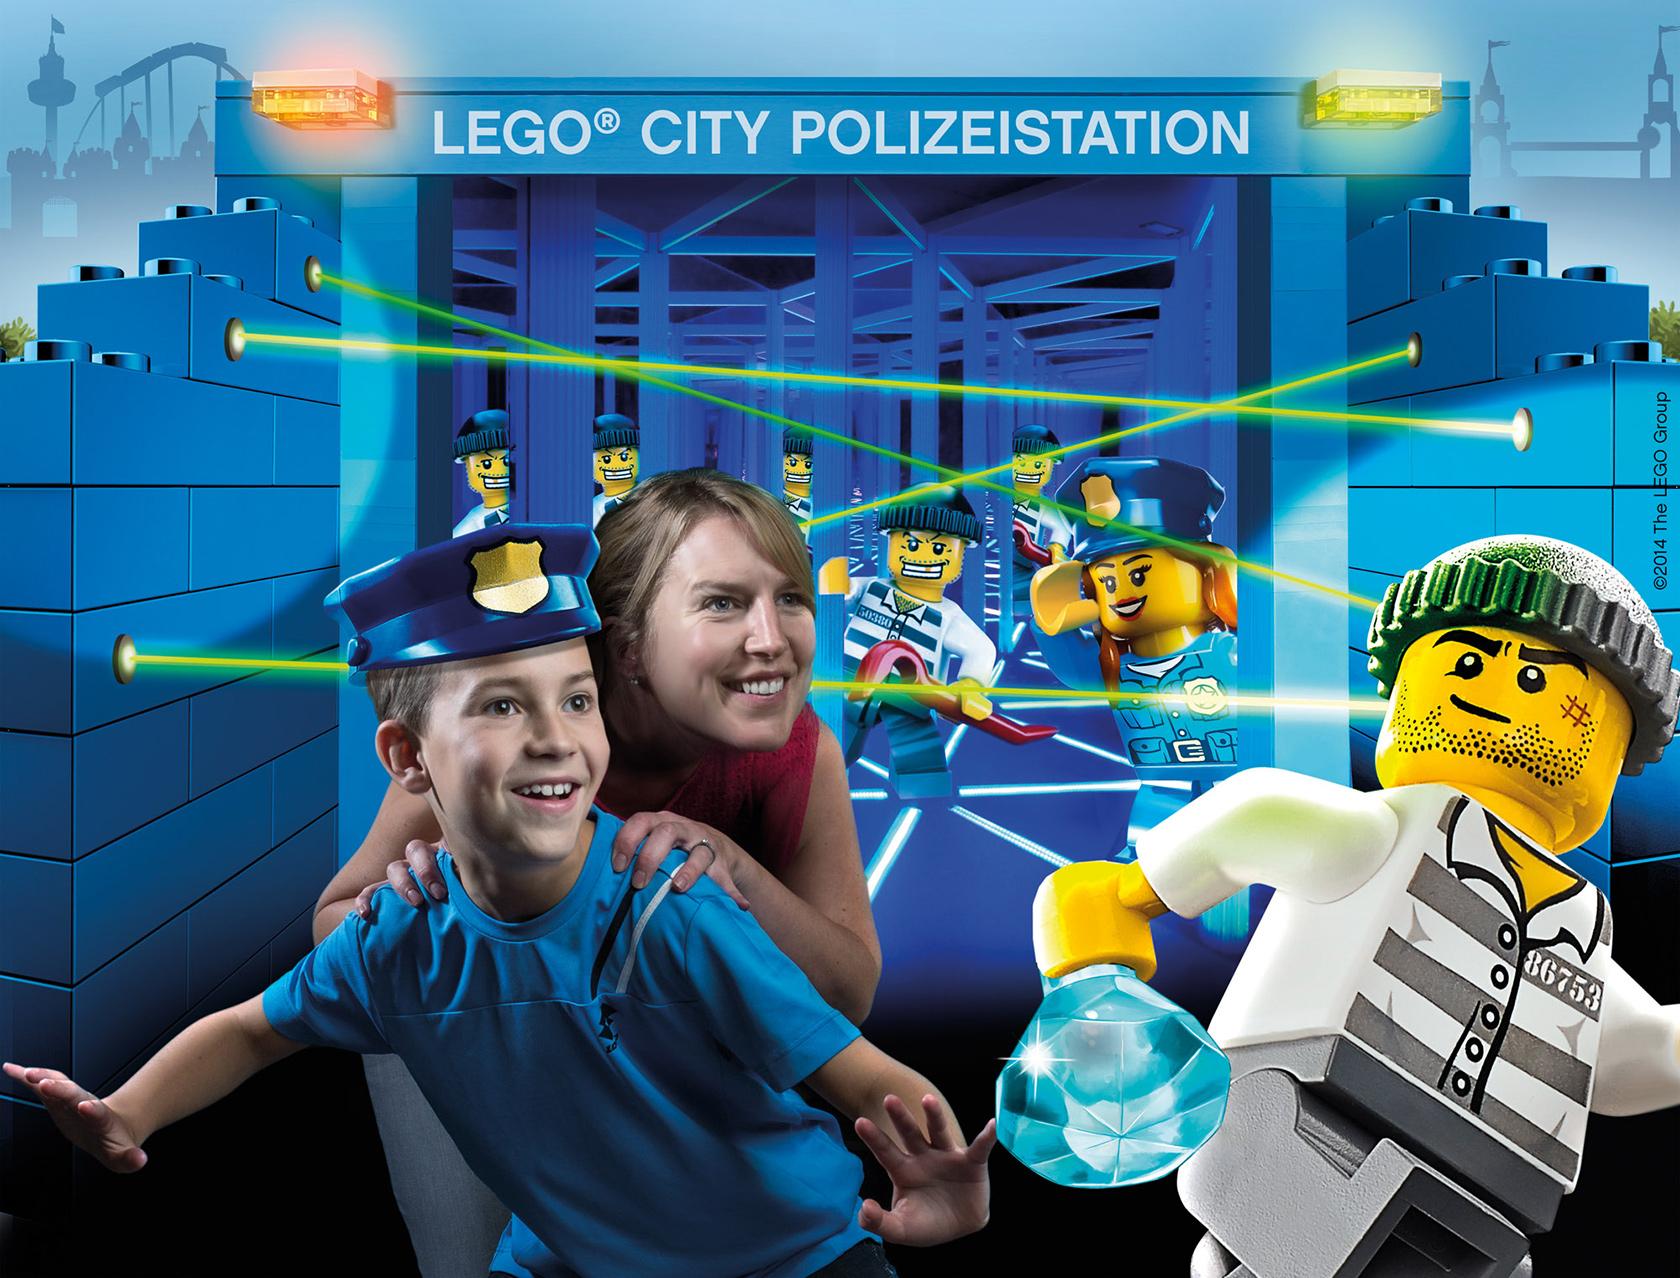 "Legoland deutschland opent laserparcours ""lego city polizeistation"